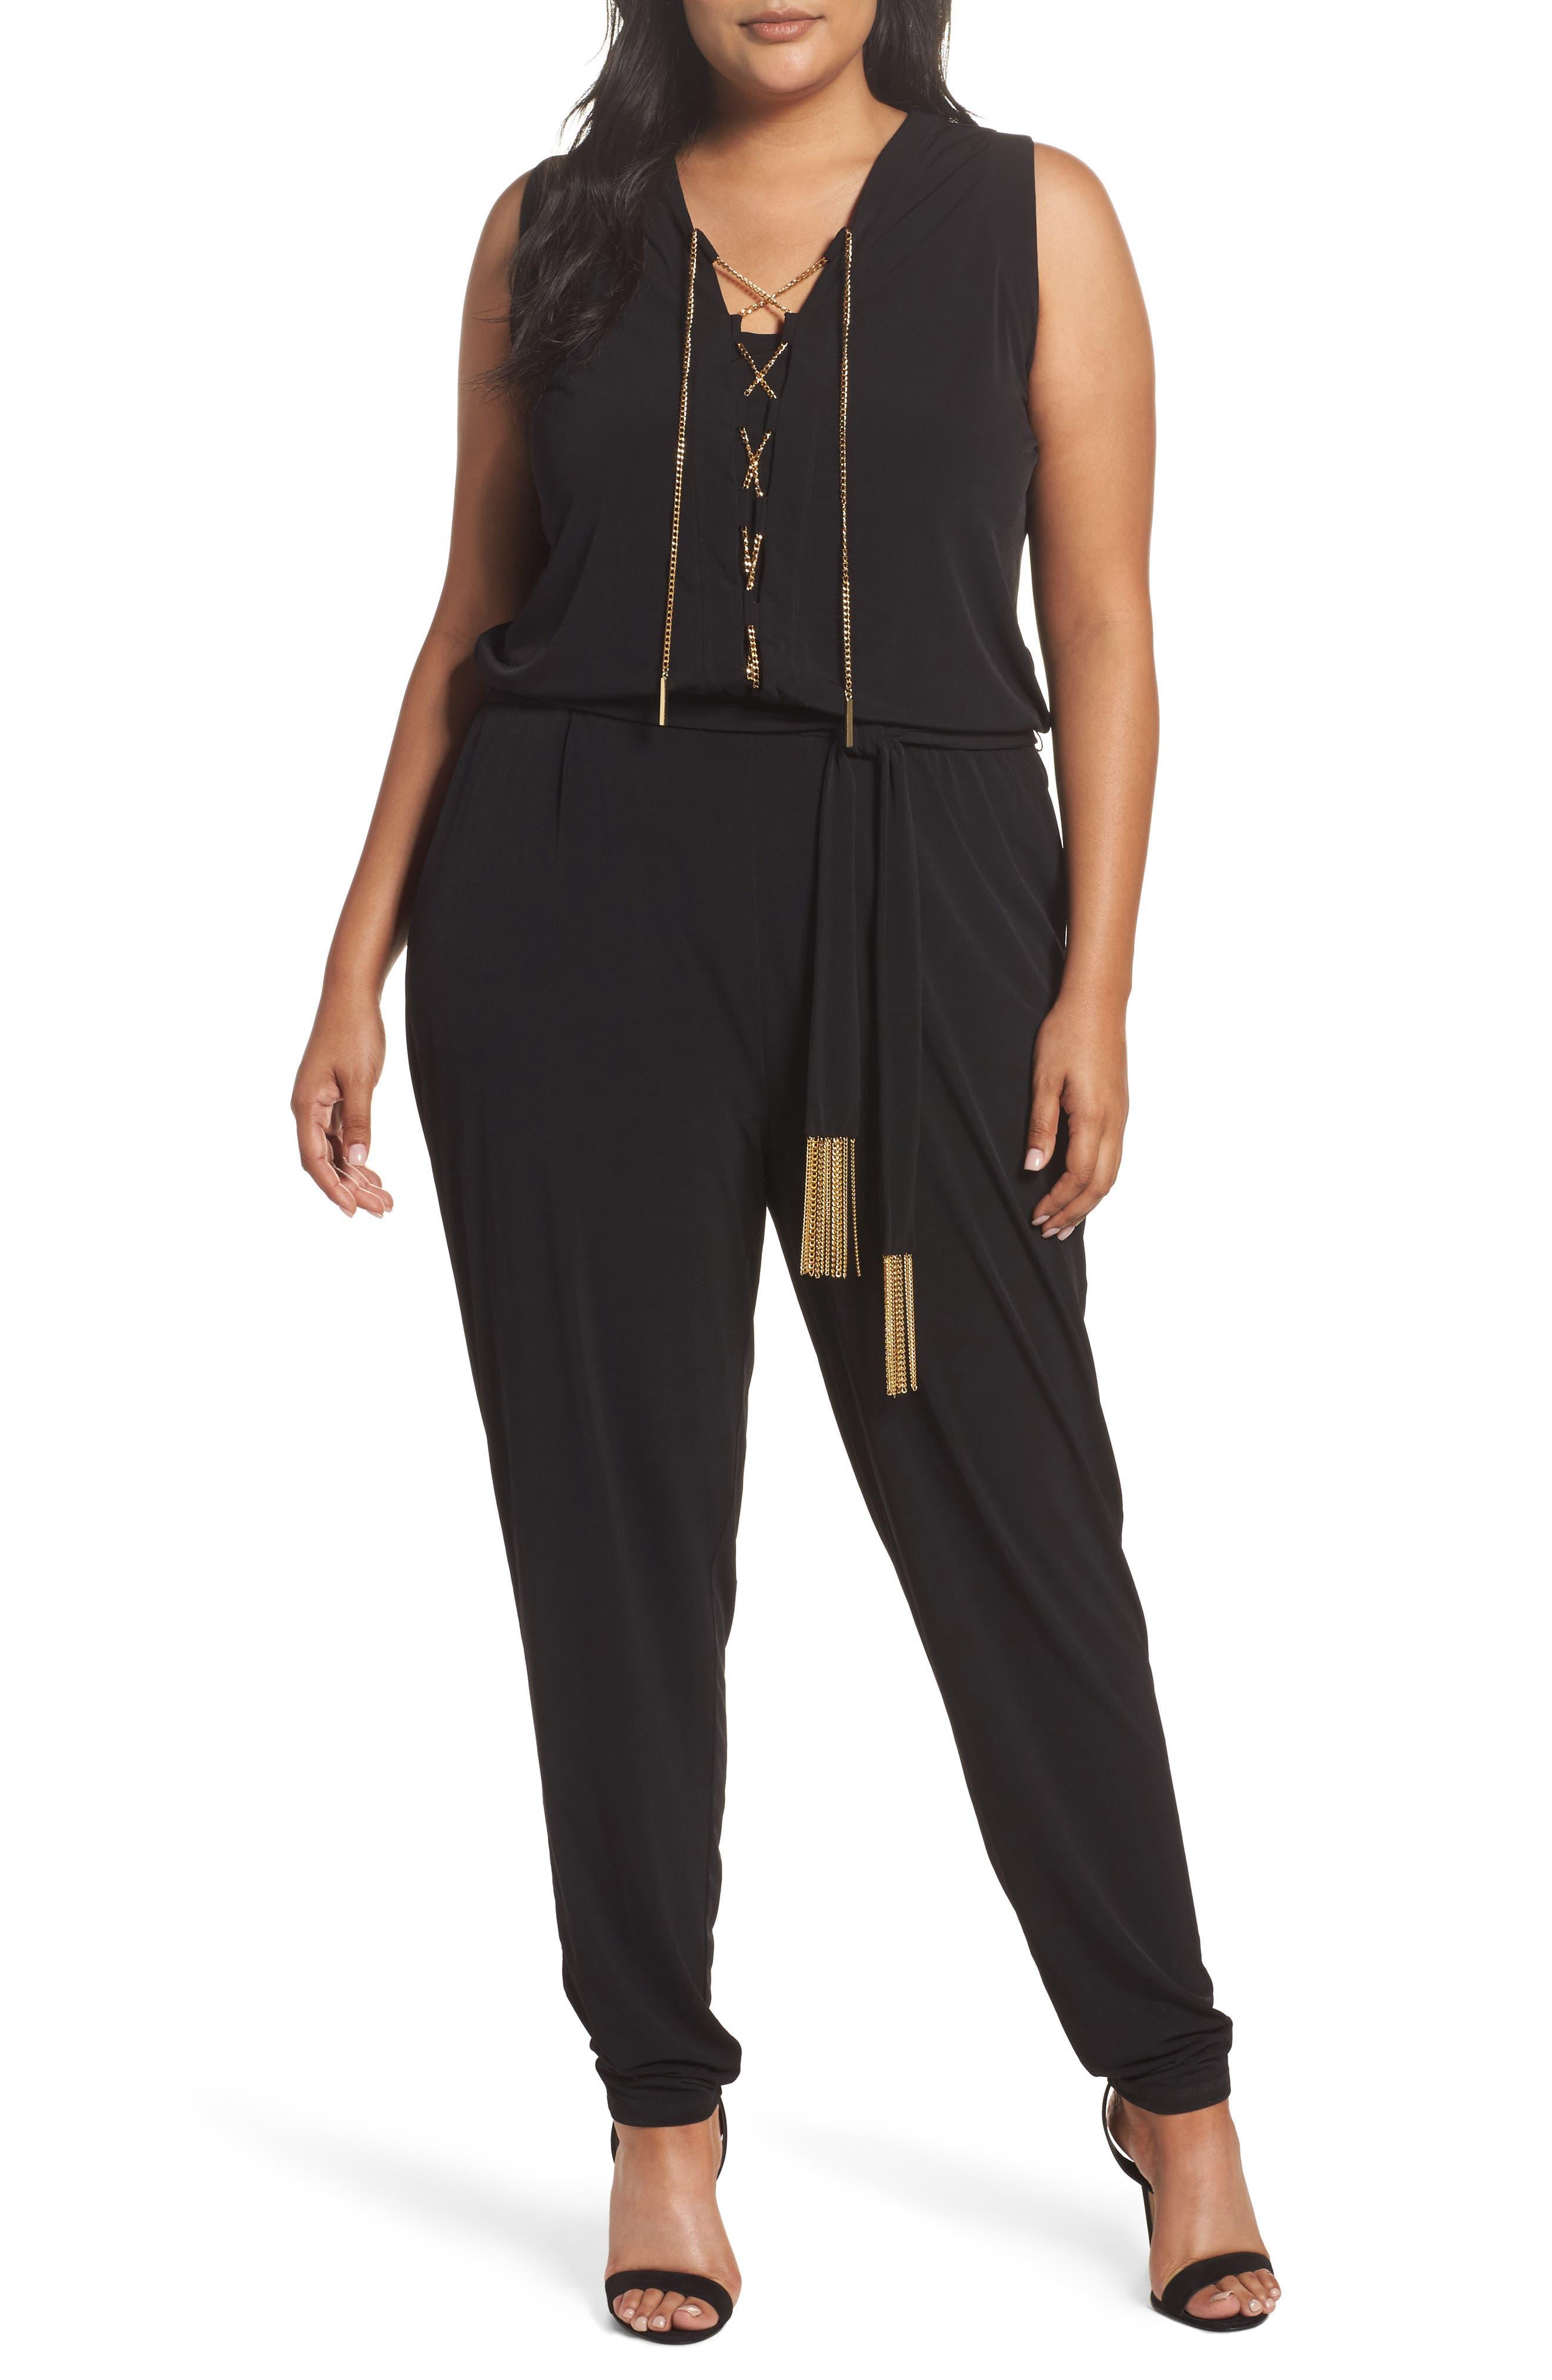 Main Image - MICHAEL Michael Kors Lace-Up Sleeveless Jumpsuit (Plus Size)